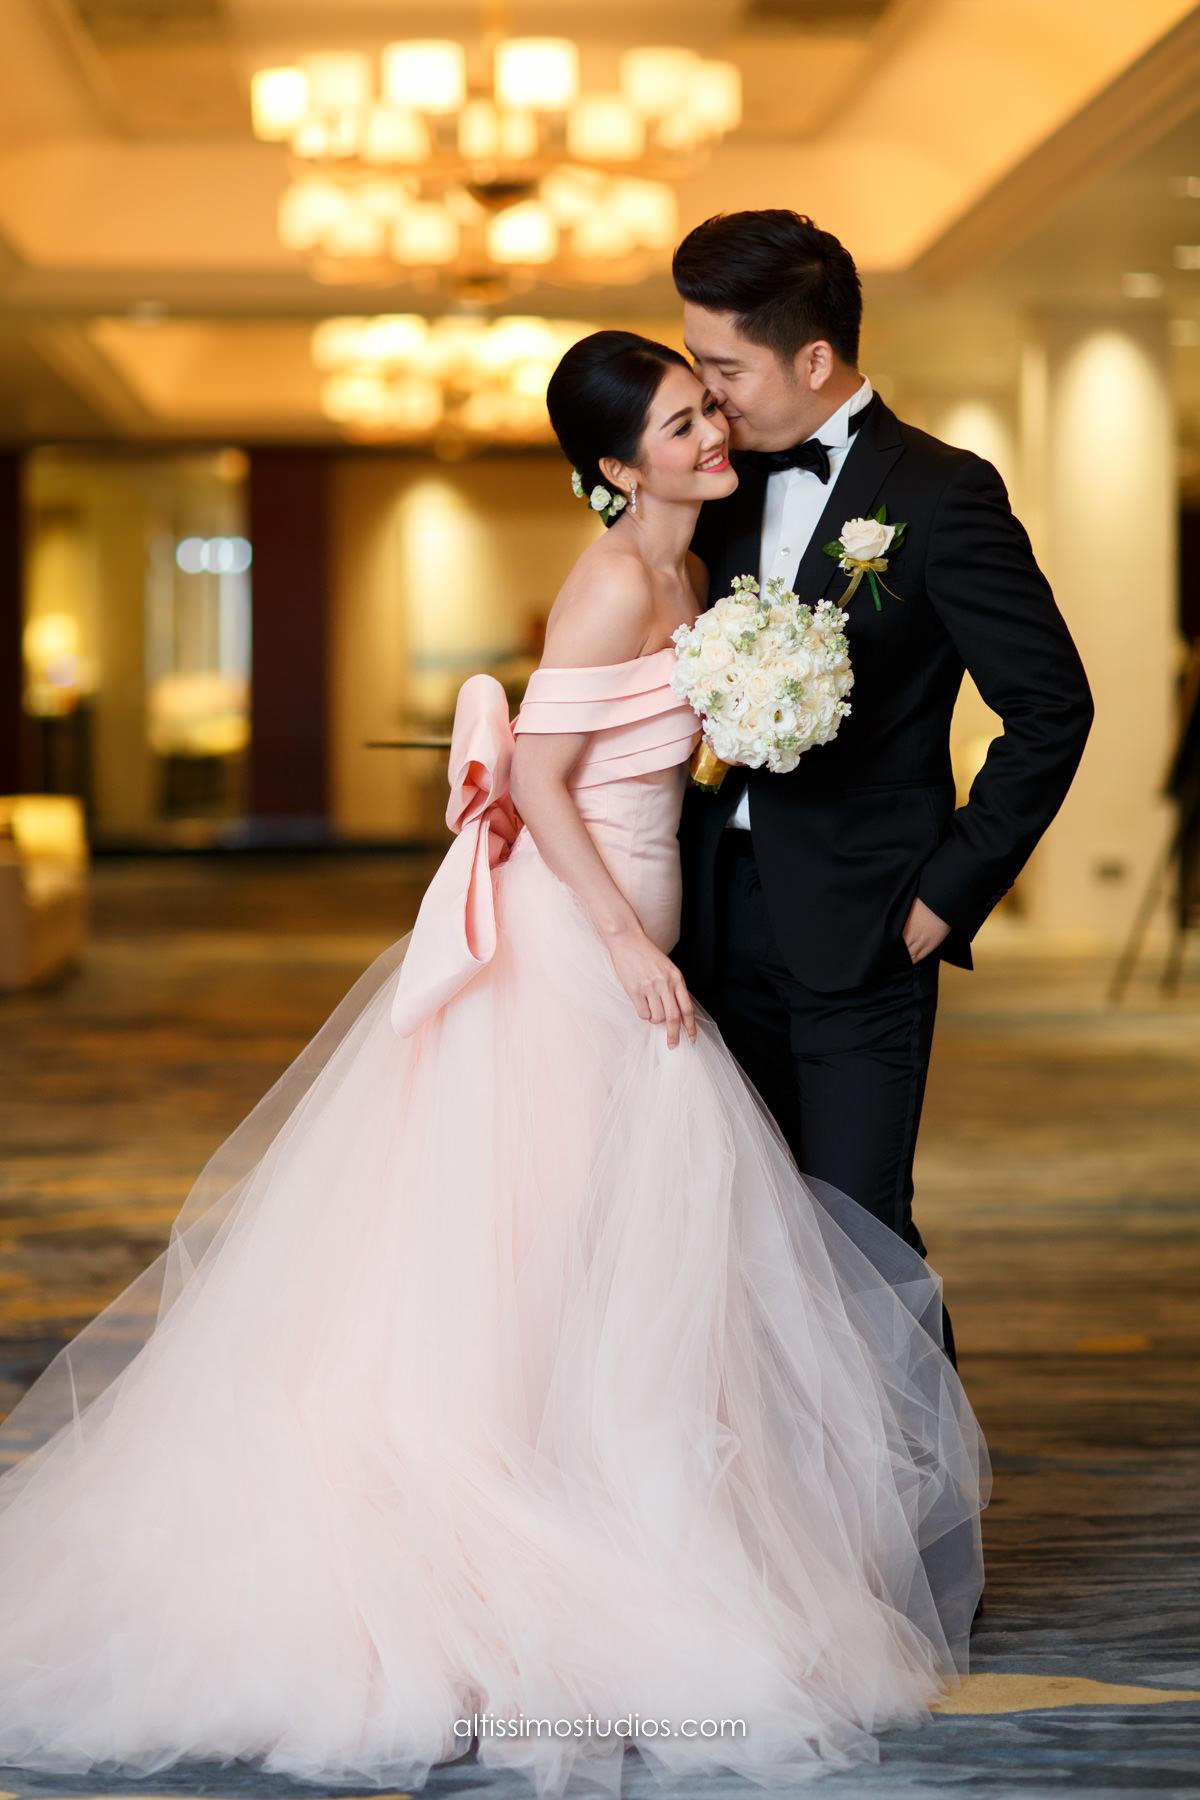 Wedding Photography Howto: Affordable Wedding Photography Singapore